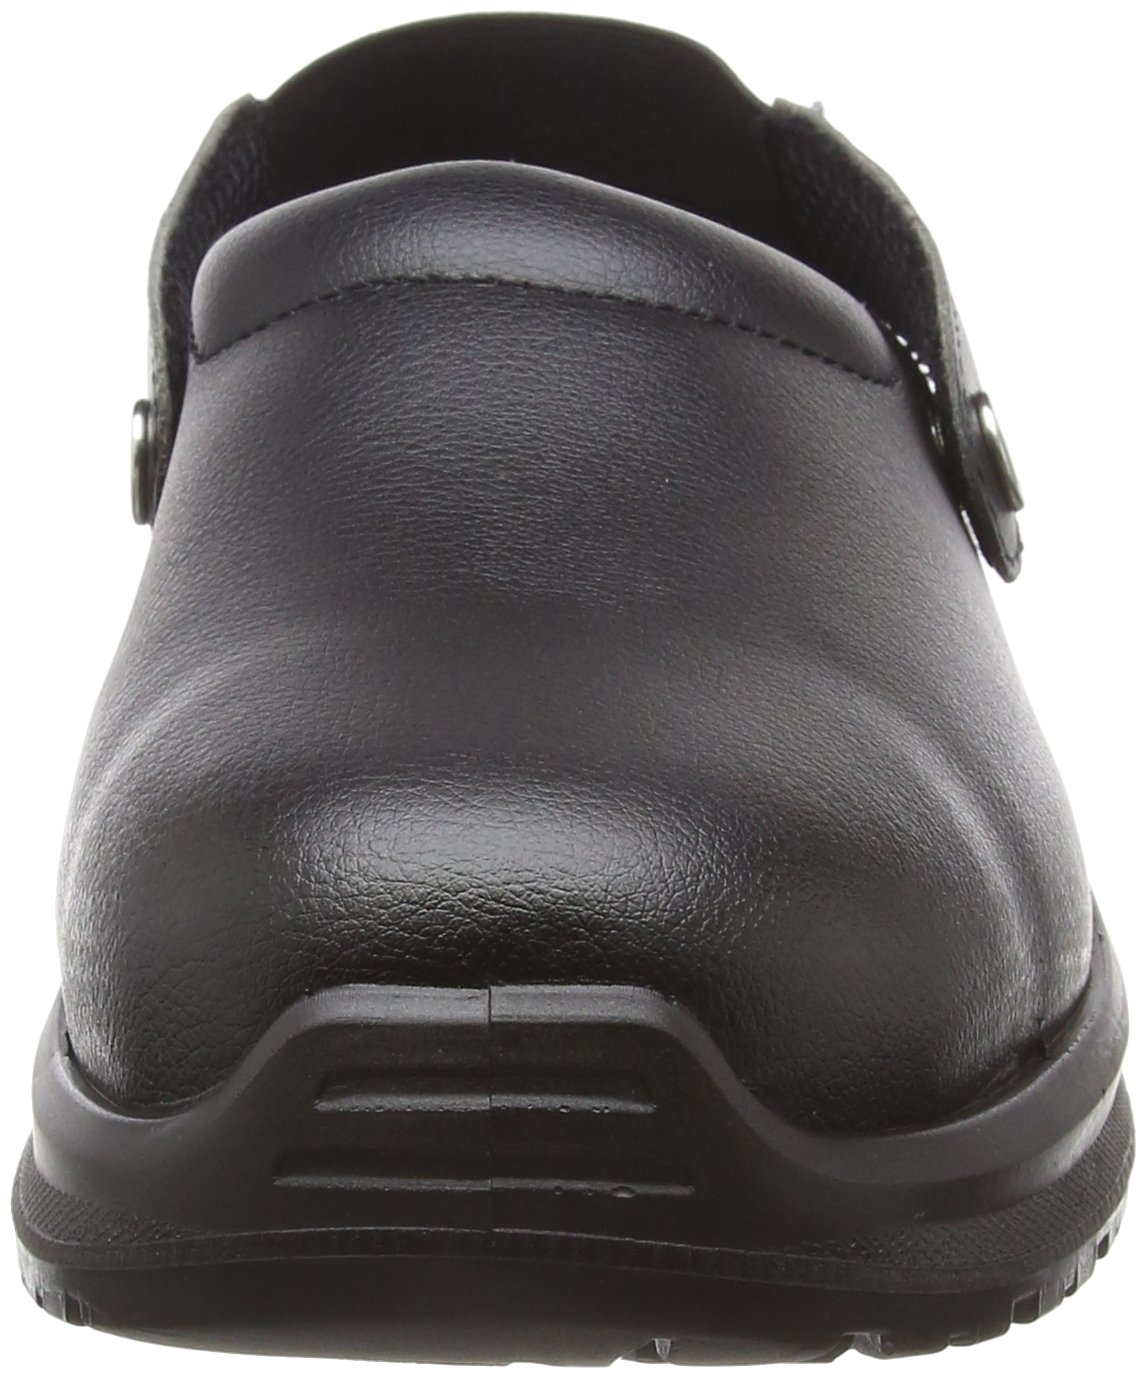 S2 SRC Blackrock SRC02B Hygiene Clog Black